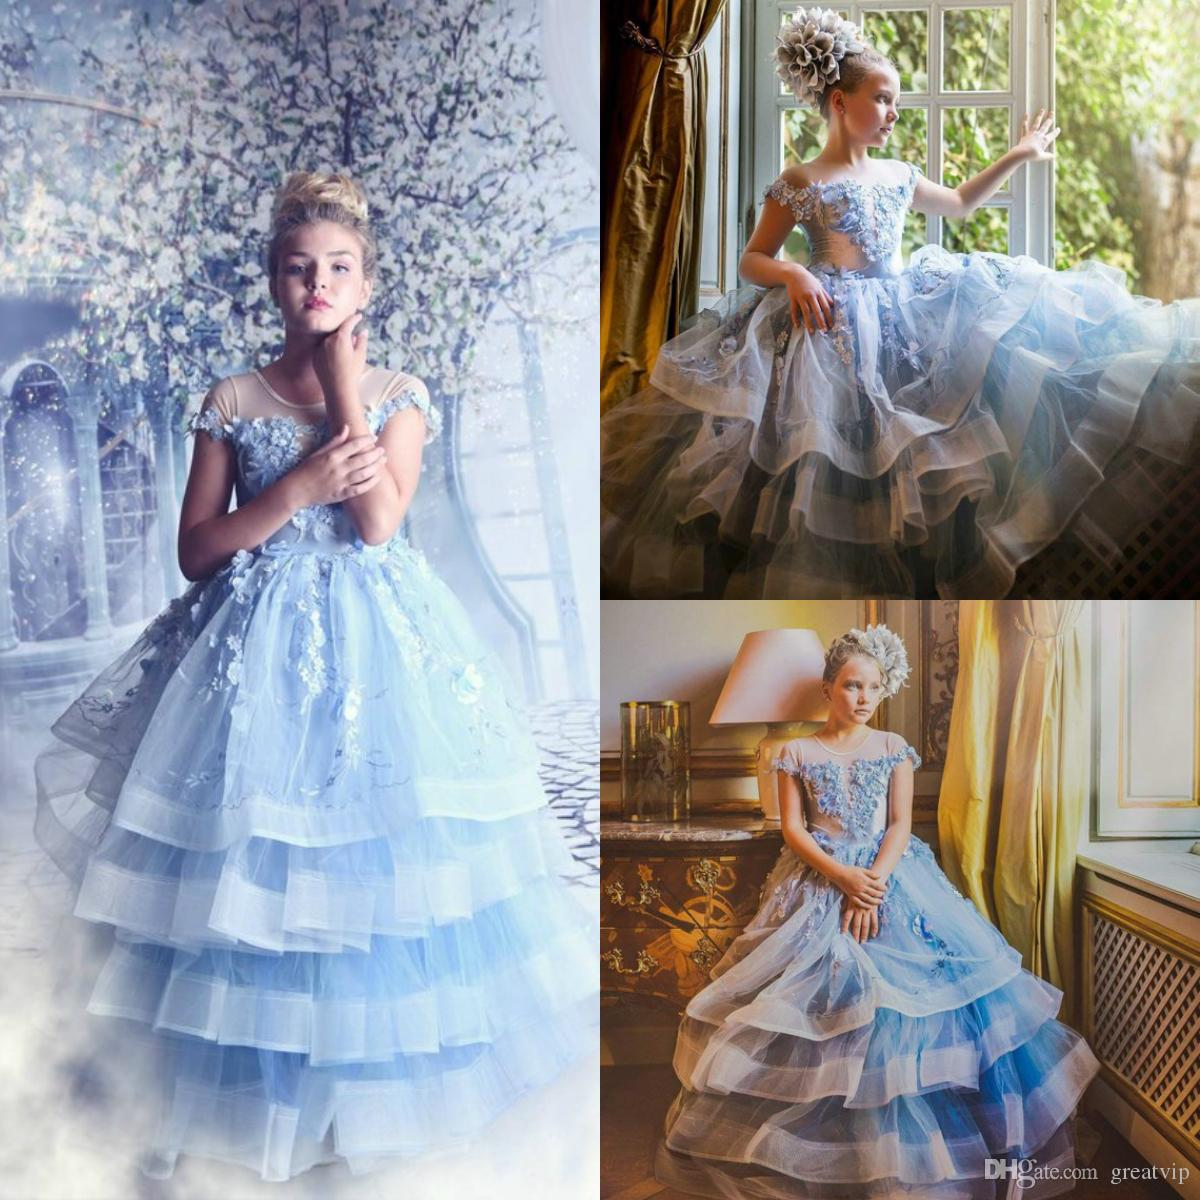 Blue Pageant Fiori ragazze abiti 3D applique floreali perline strati Tulle Teens Princess Birthday Party Dress Princess Weddnig Prom Gowns